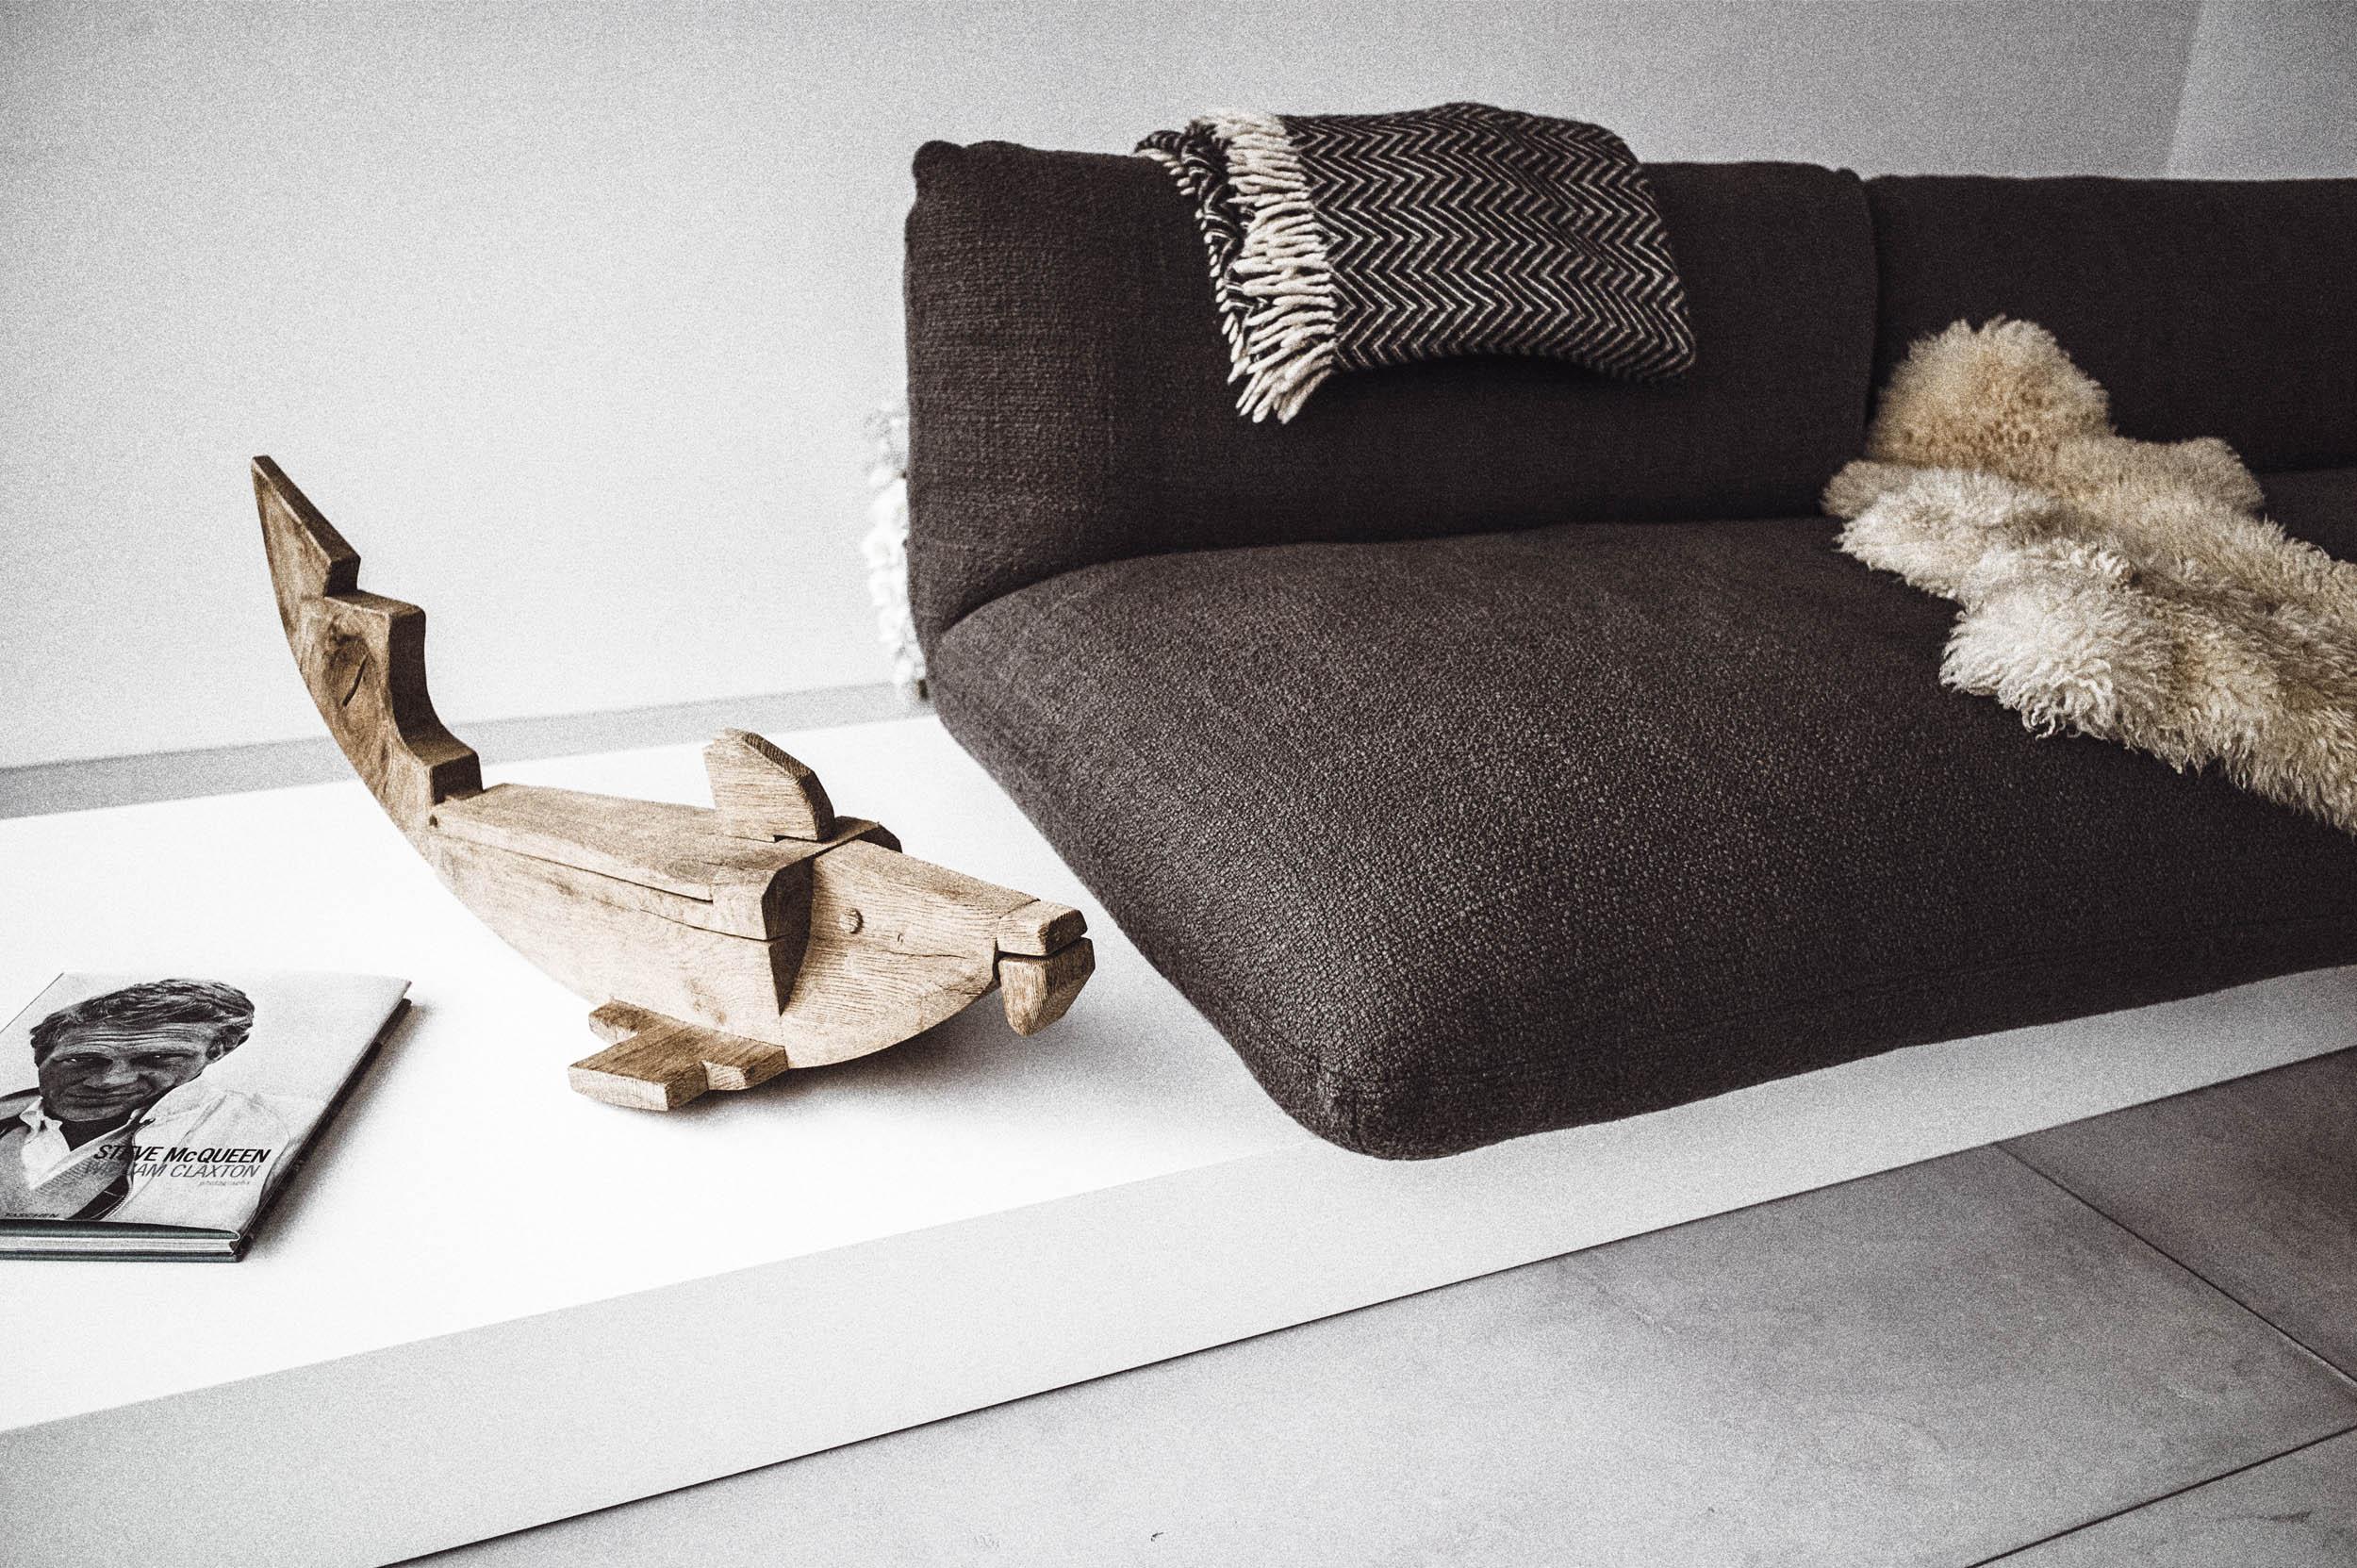 seifertuebler-corporate-handcraft-woodsculpture-vogel-12.jpg